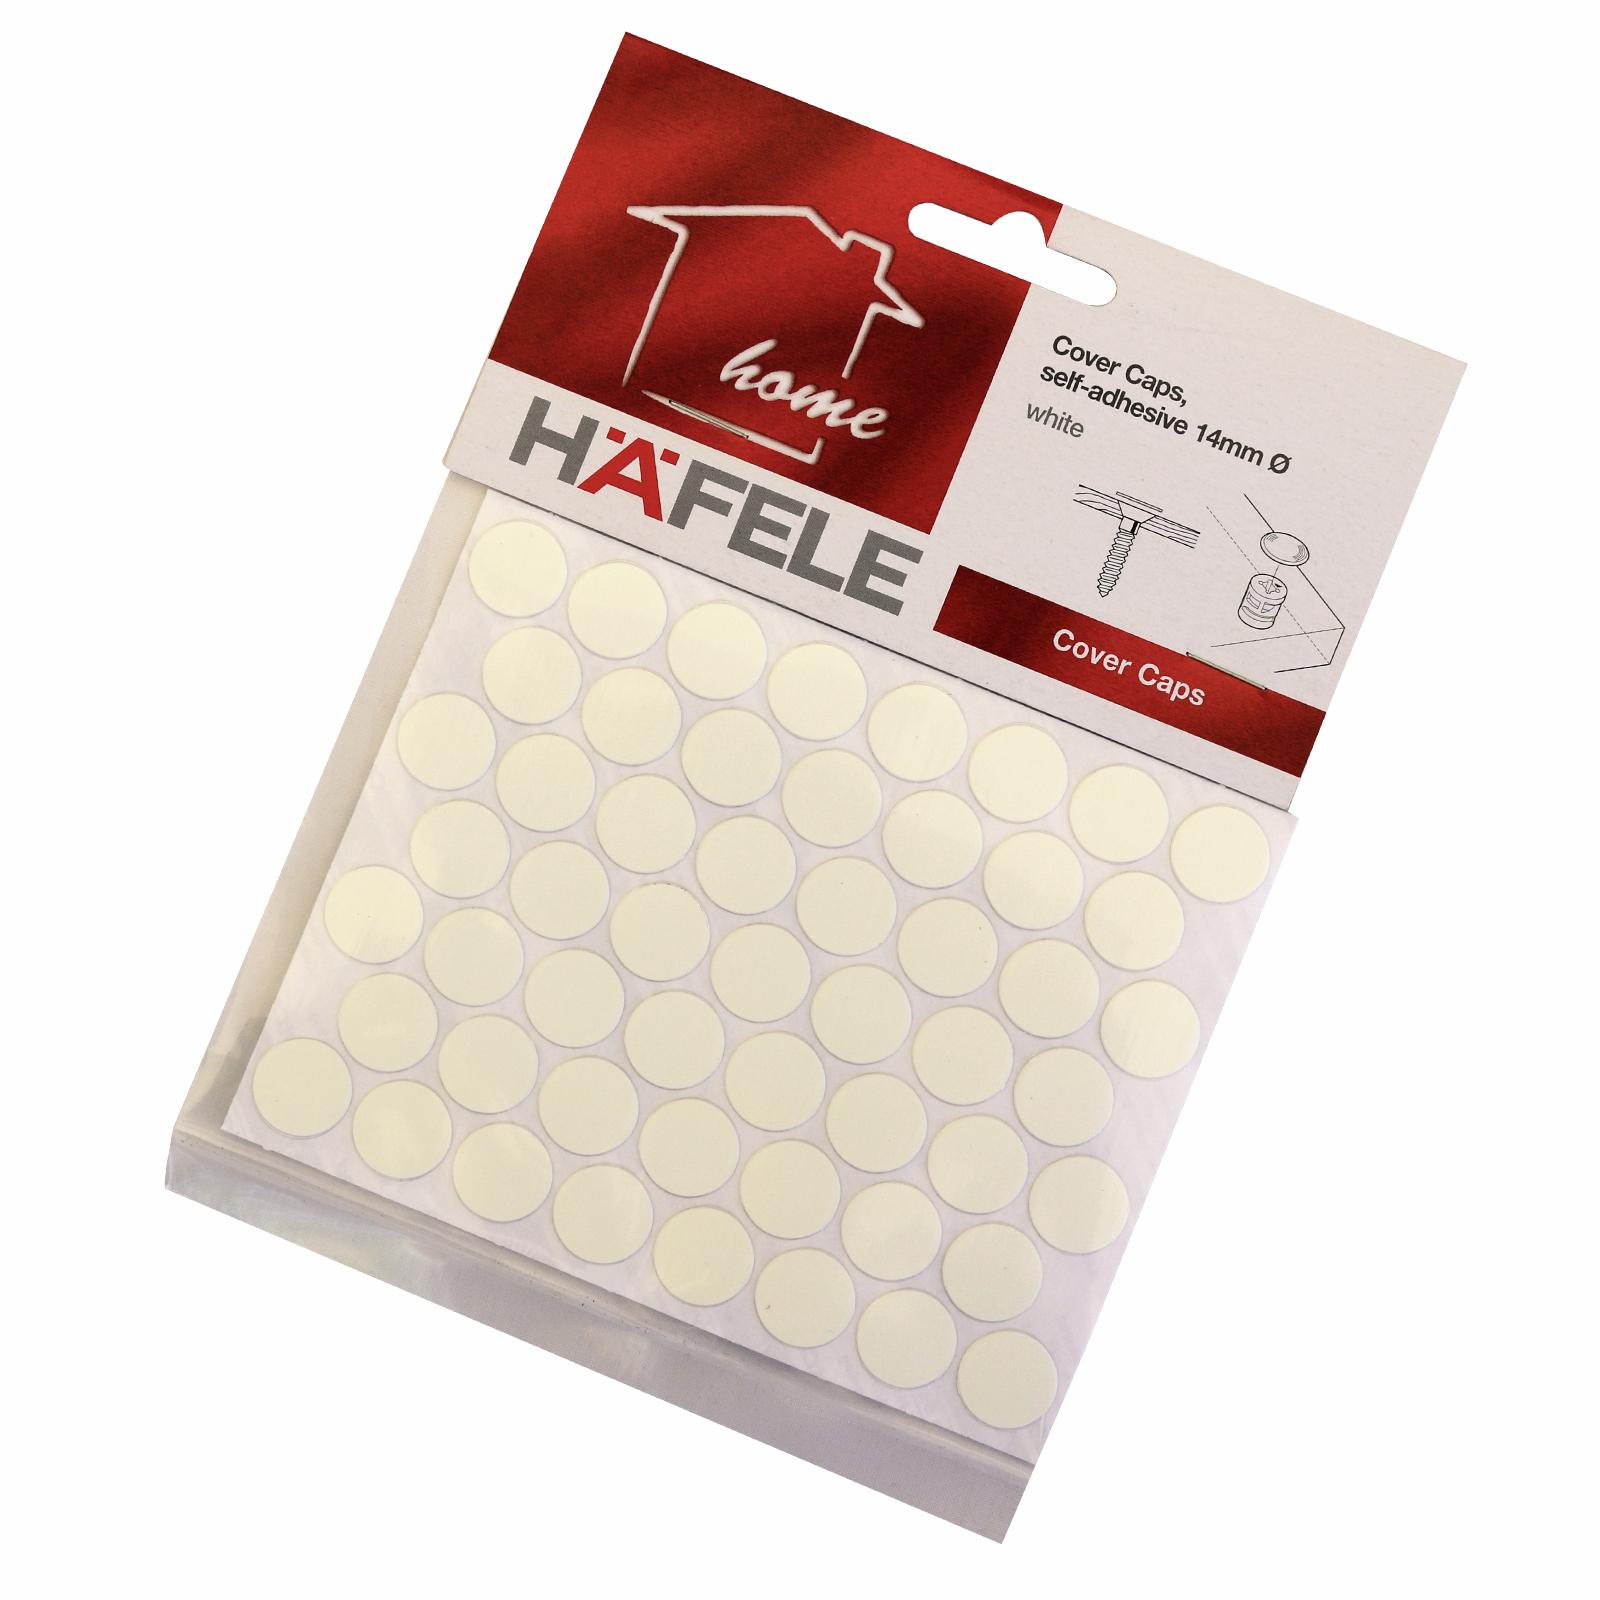 Hafele 14mm White Self Adhesive Cover Cap - 52 Pack